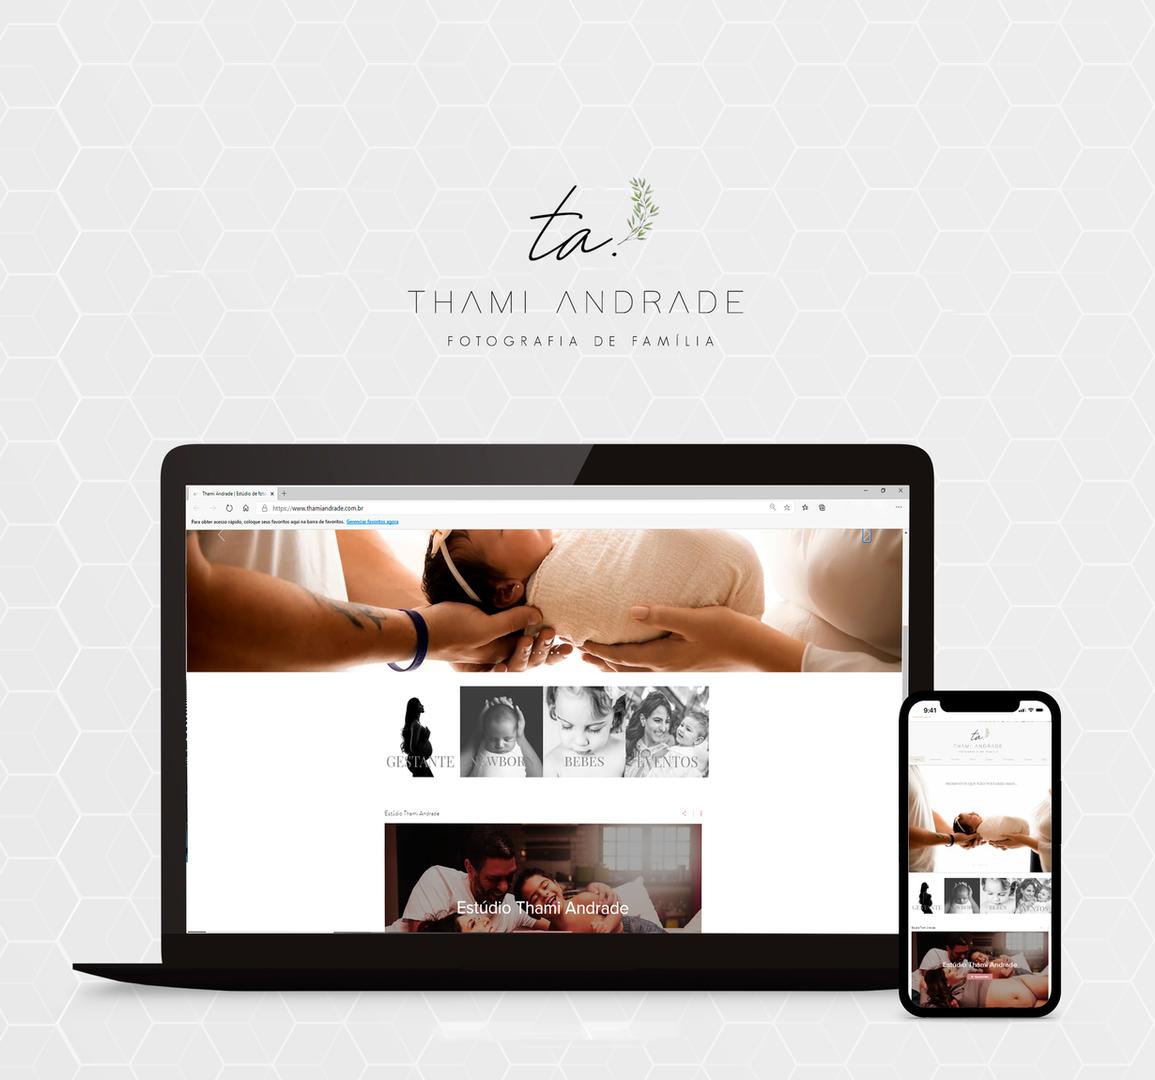 Site Estúdio Thami Andrade